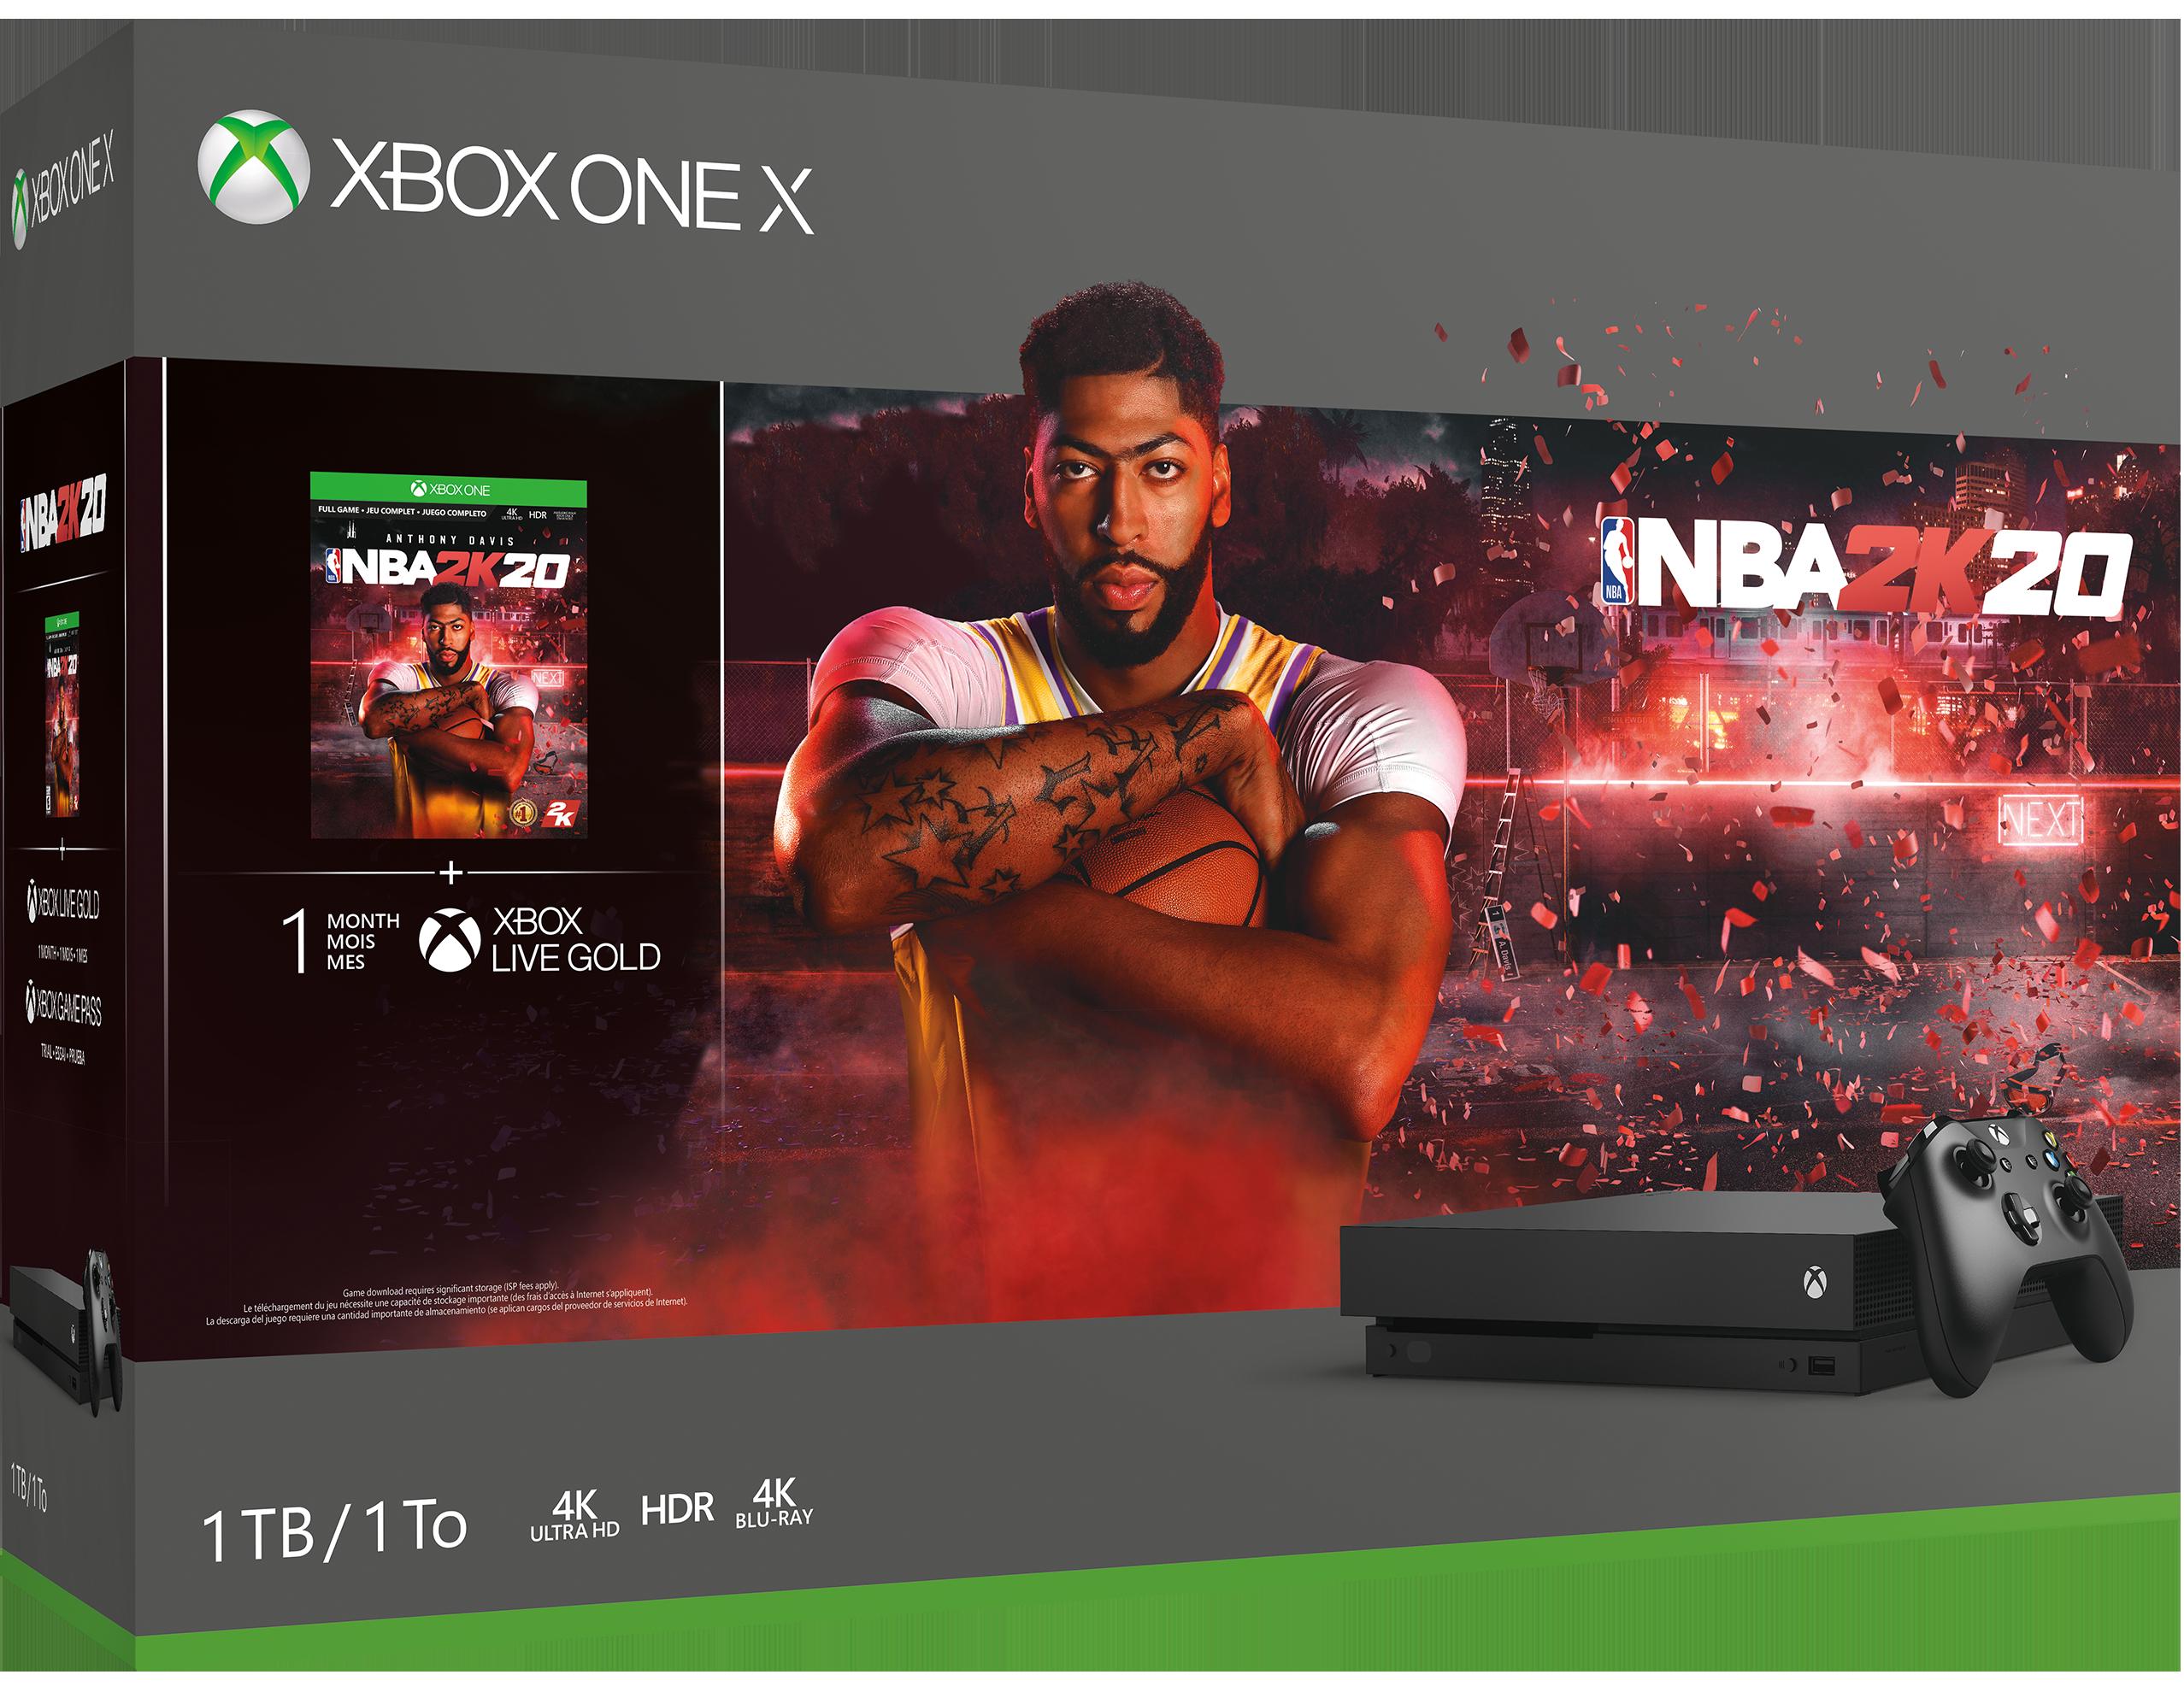 Xbox One X 1TB Console - NBA 2K20 Bundle